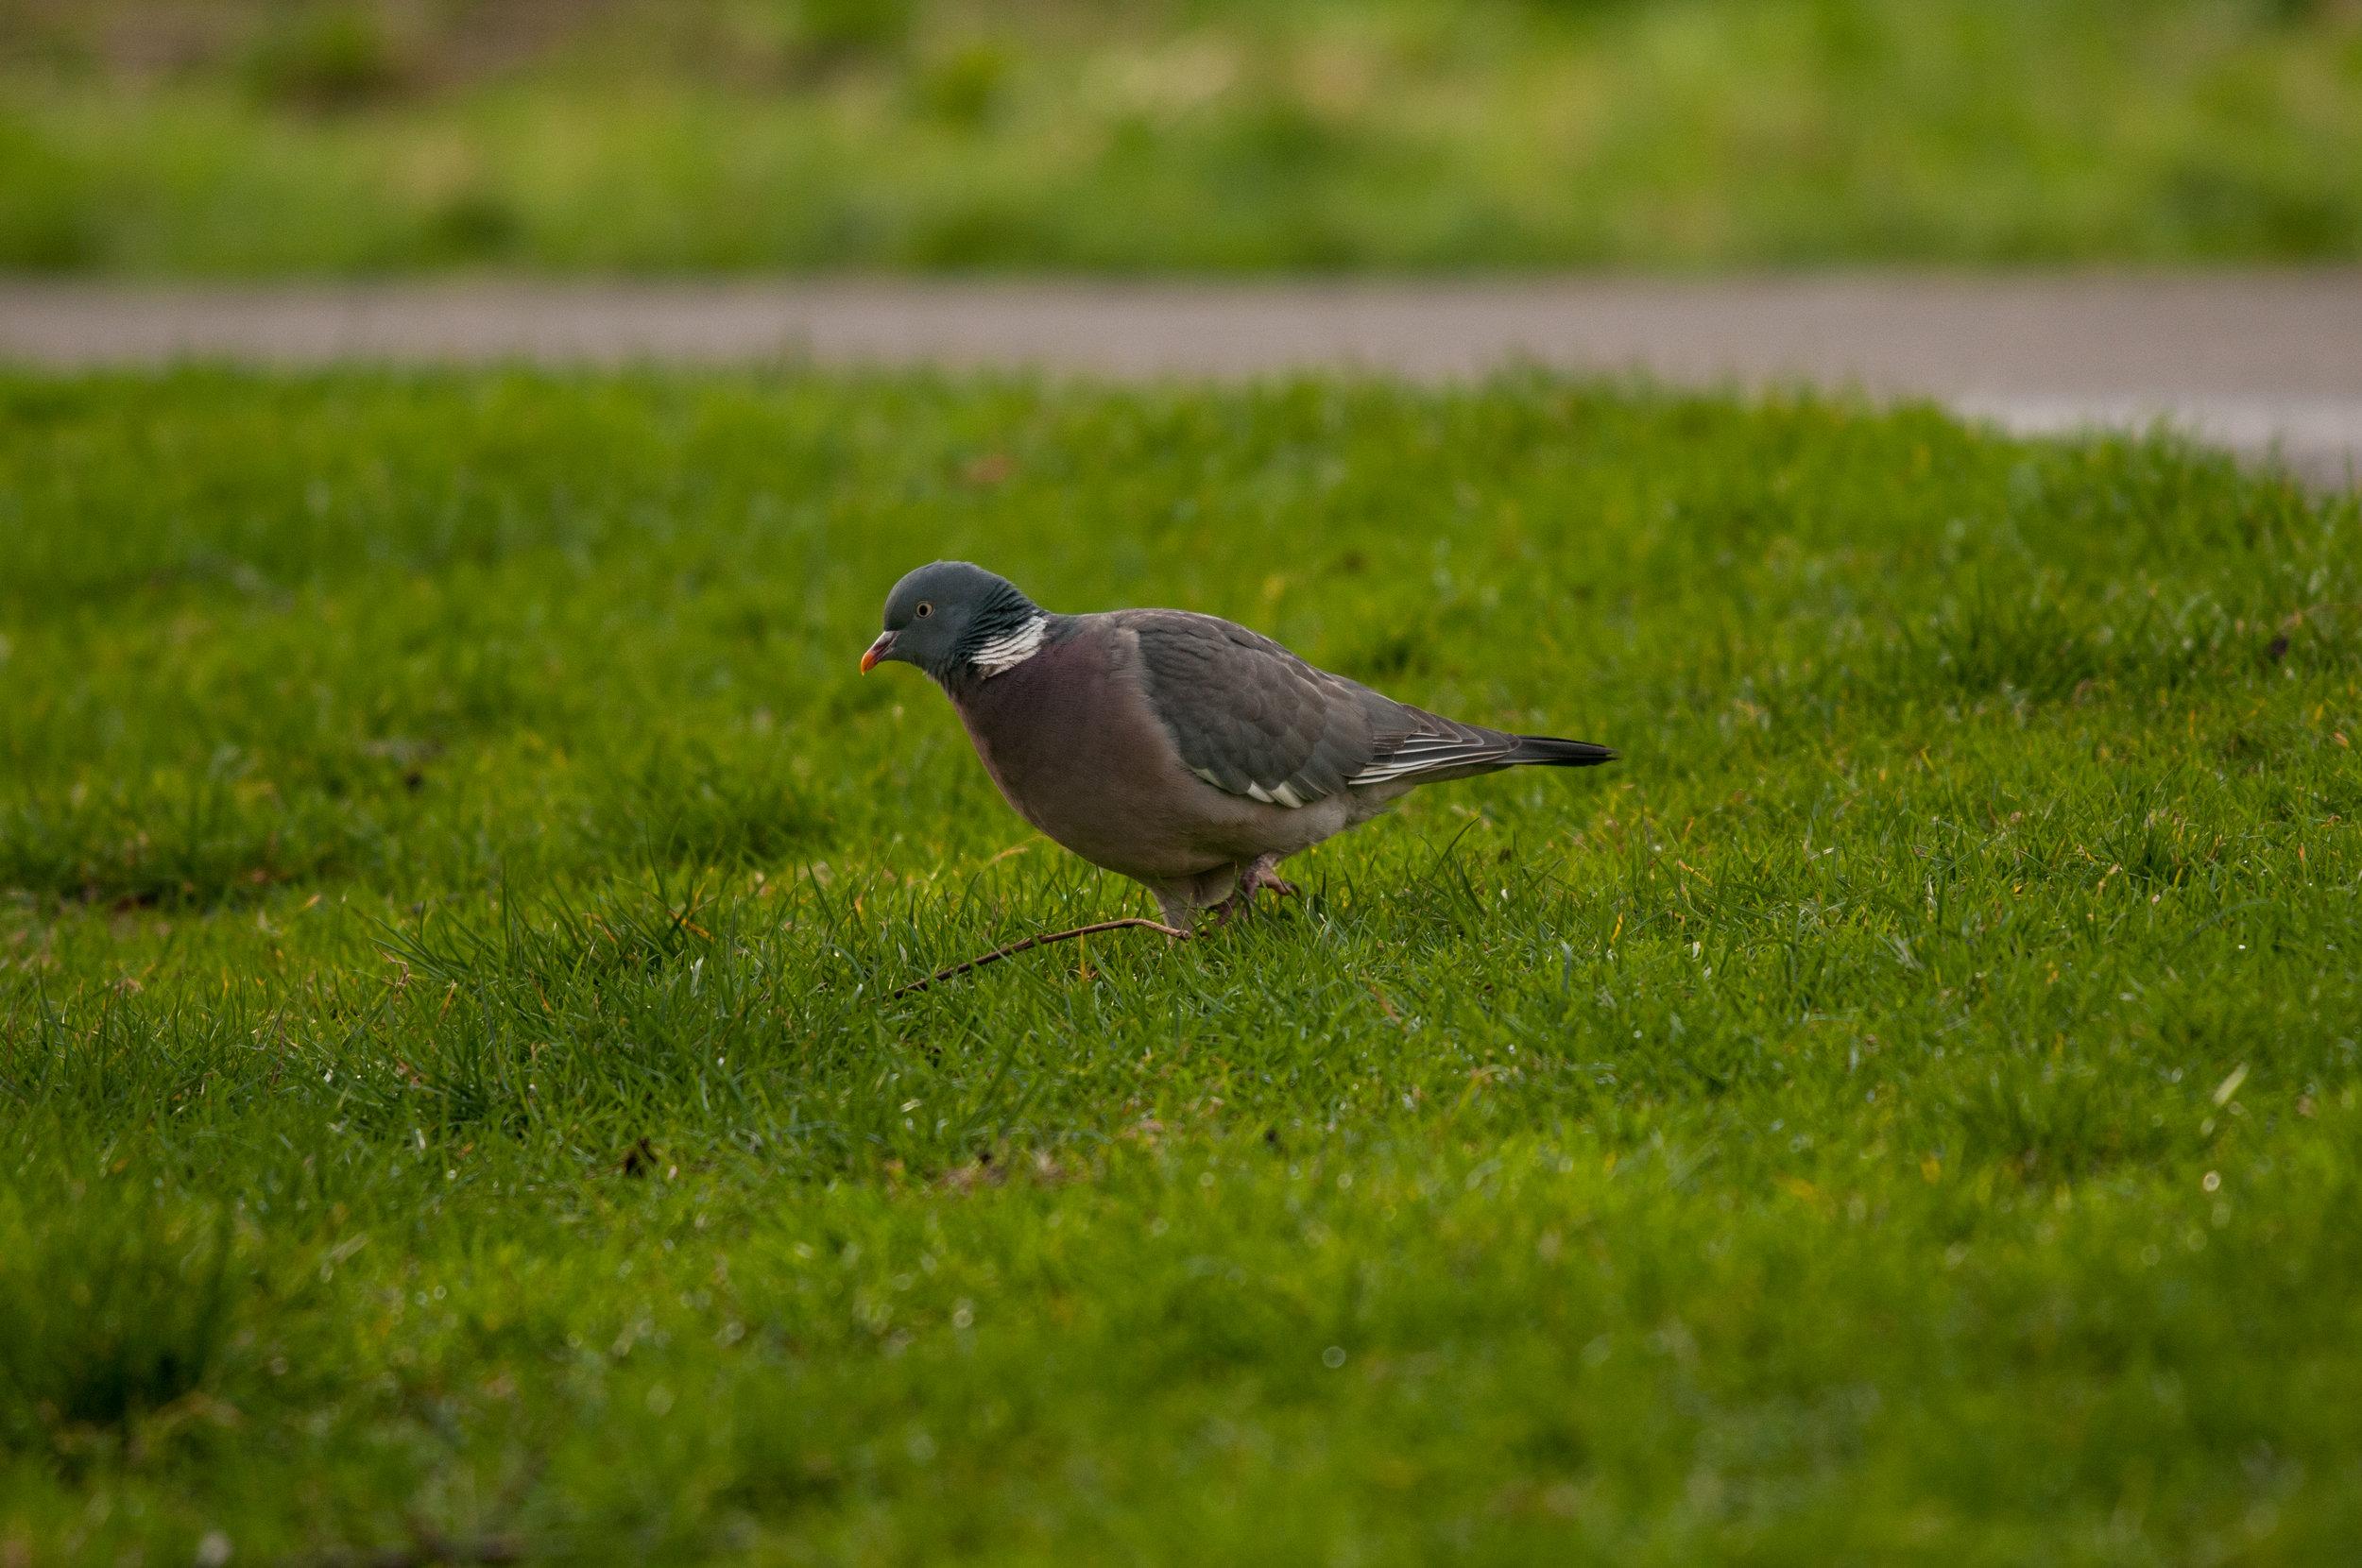 Ptaki Lochend - 2019 - MAR_4521.jpg